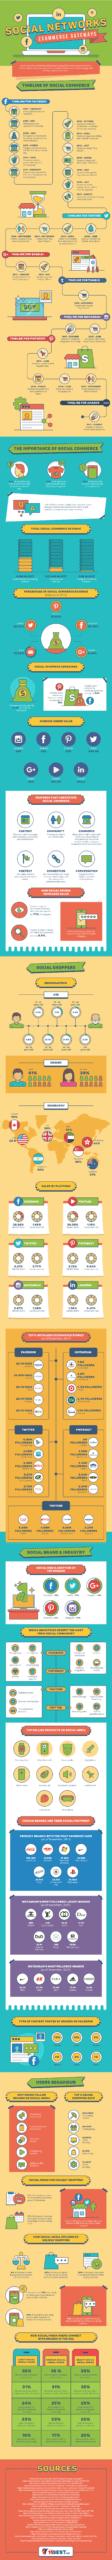 Infographic on social media marketing